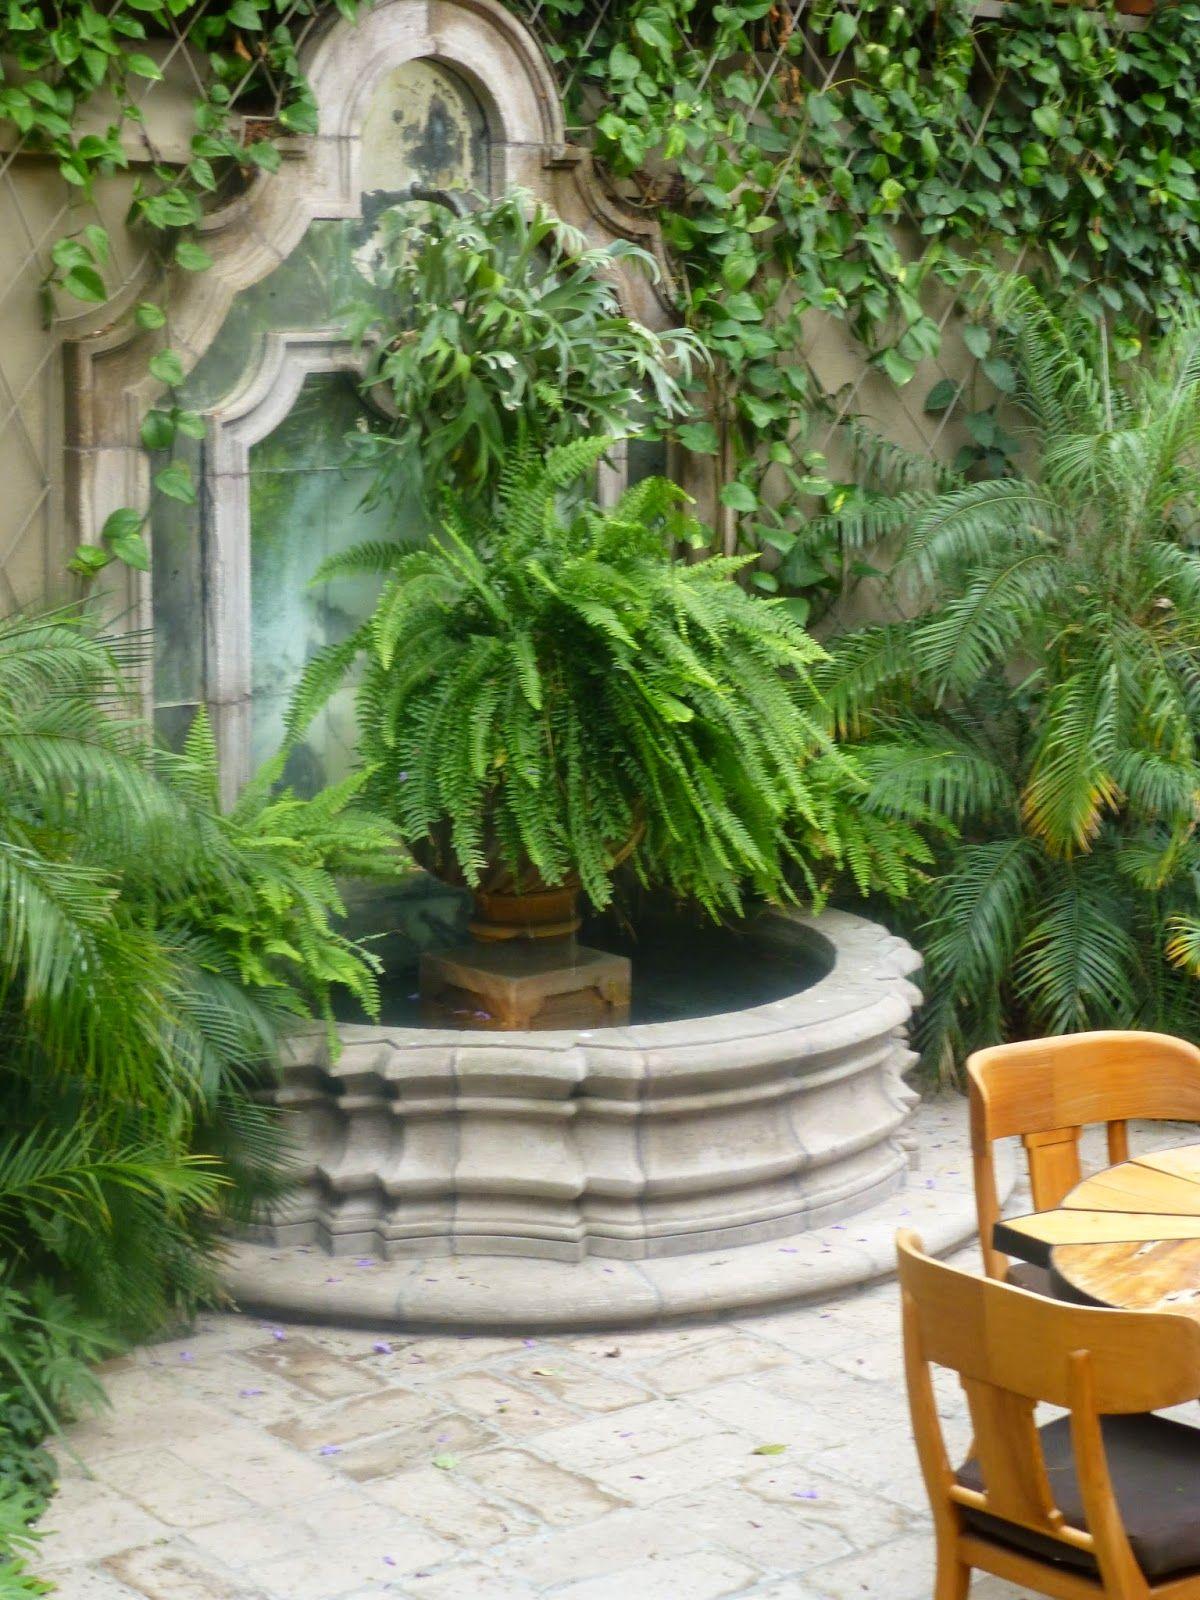 Home garden style  Romancing the Home San Miguel de Allende Design Style  Favorite